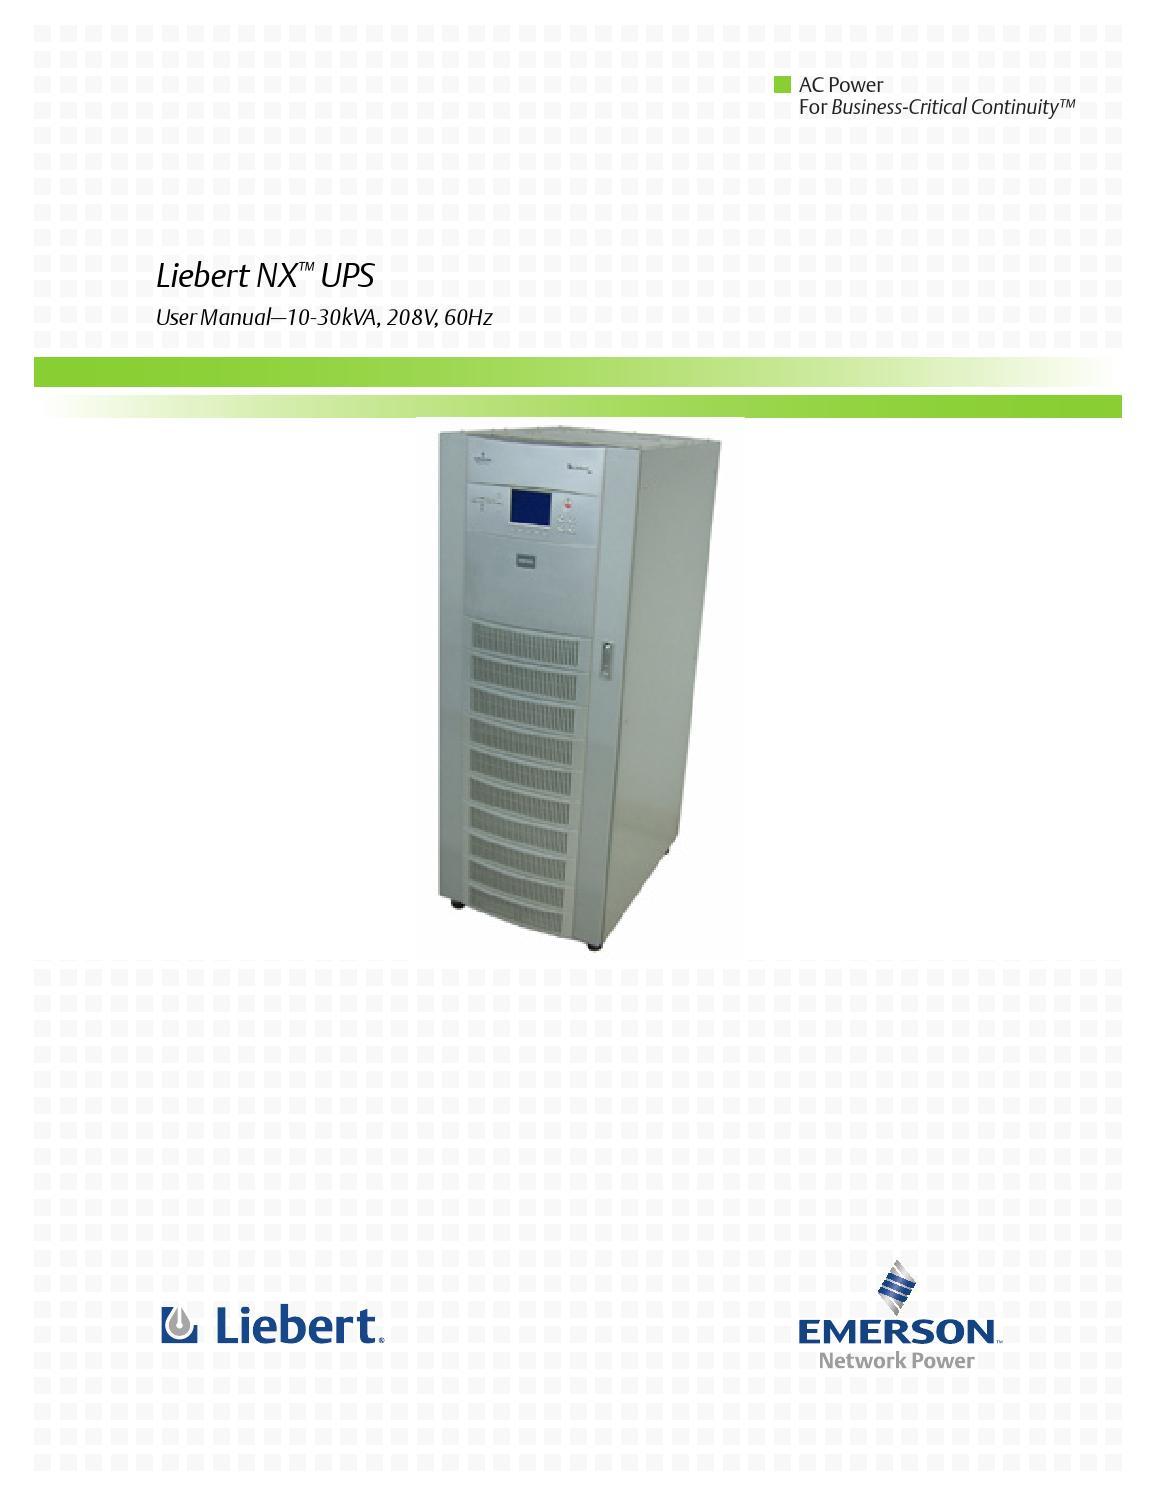 manual de usuario ups liebert modelo nx de 10 15 20 y 30 kva a o rh issuu com Emerson Fan Wiring Diagrams Emerson Electric Motor Diagram